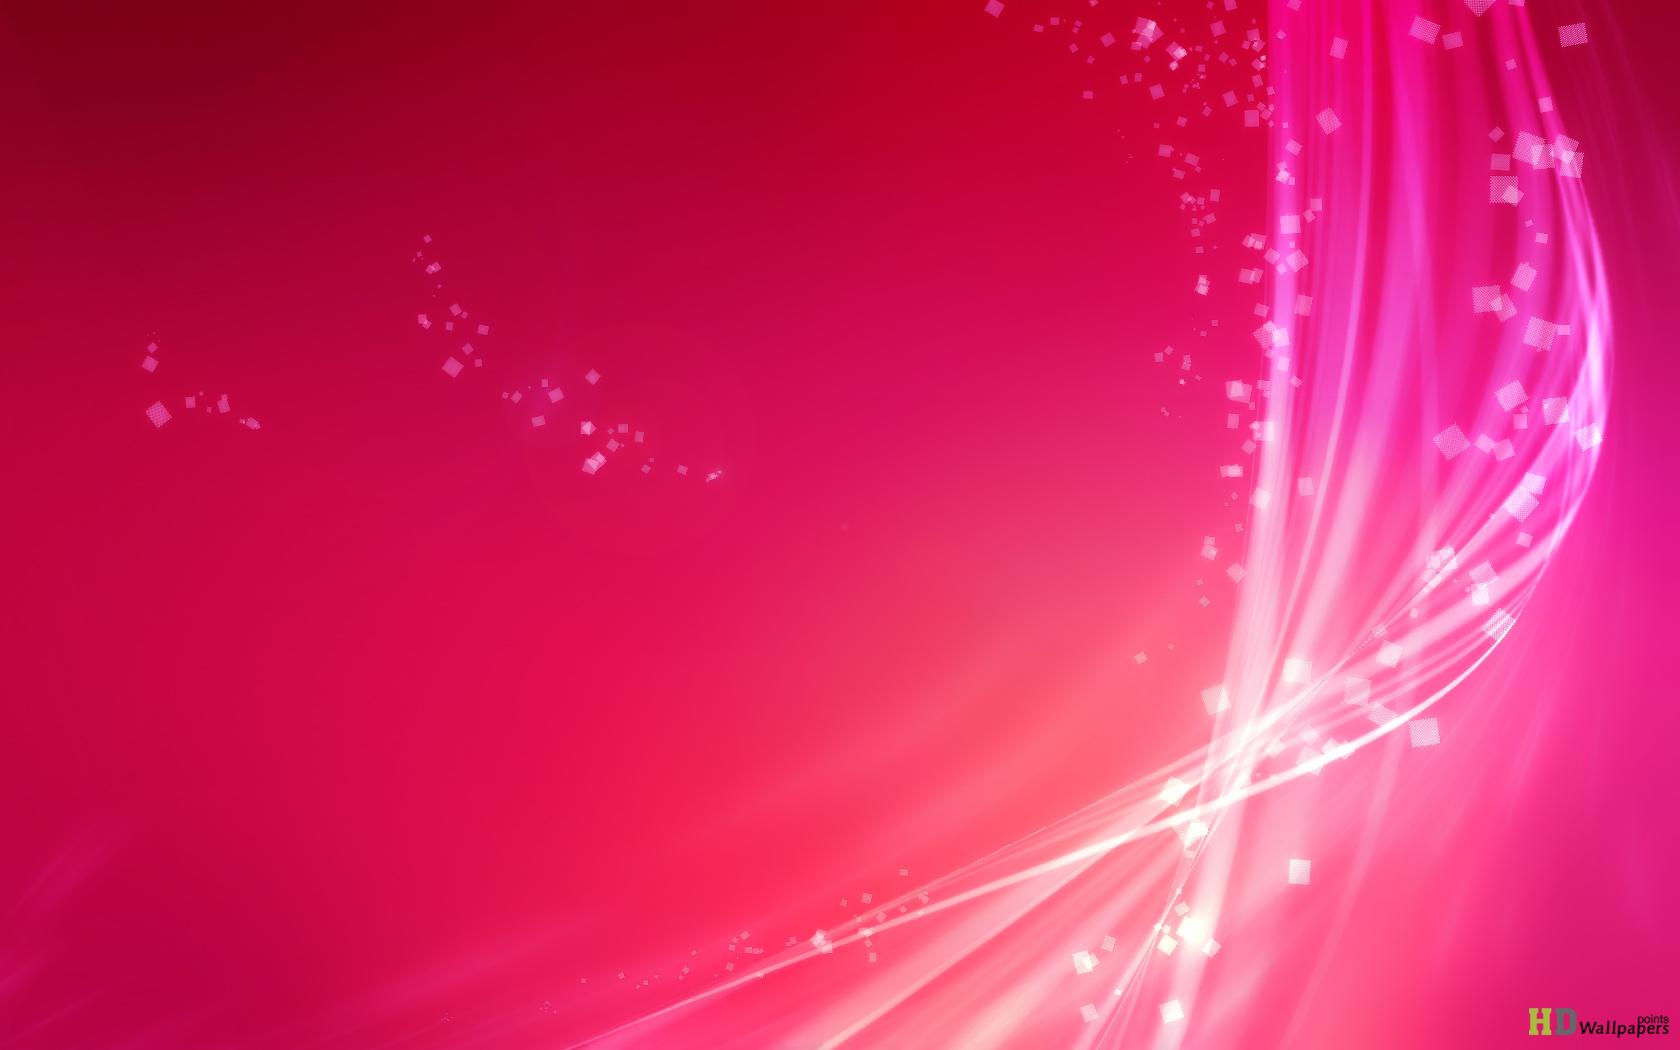 Free Pink Wallpapers - WallpaperSafari